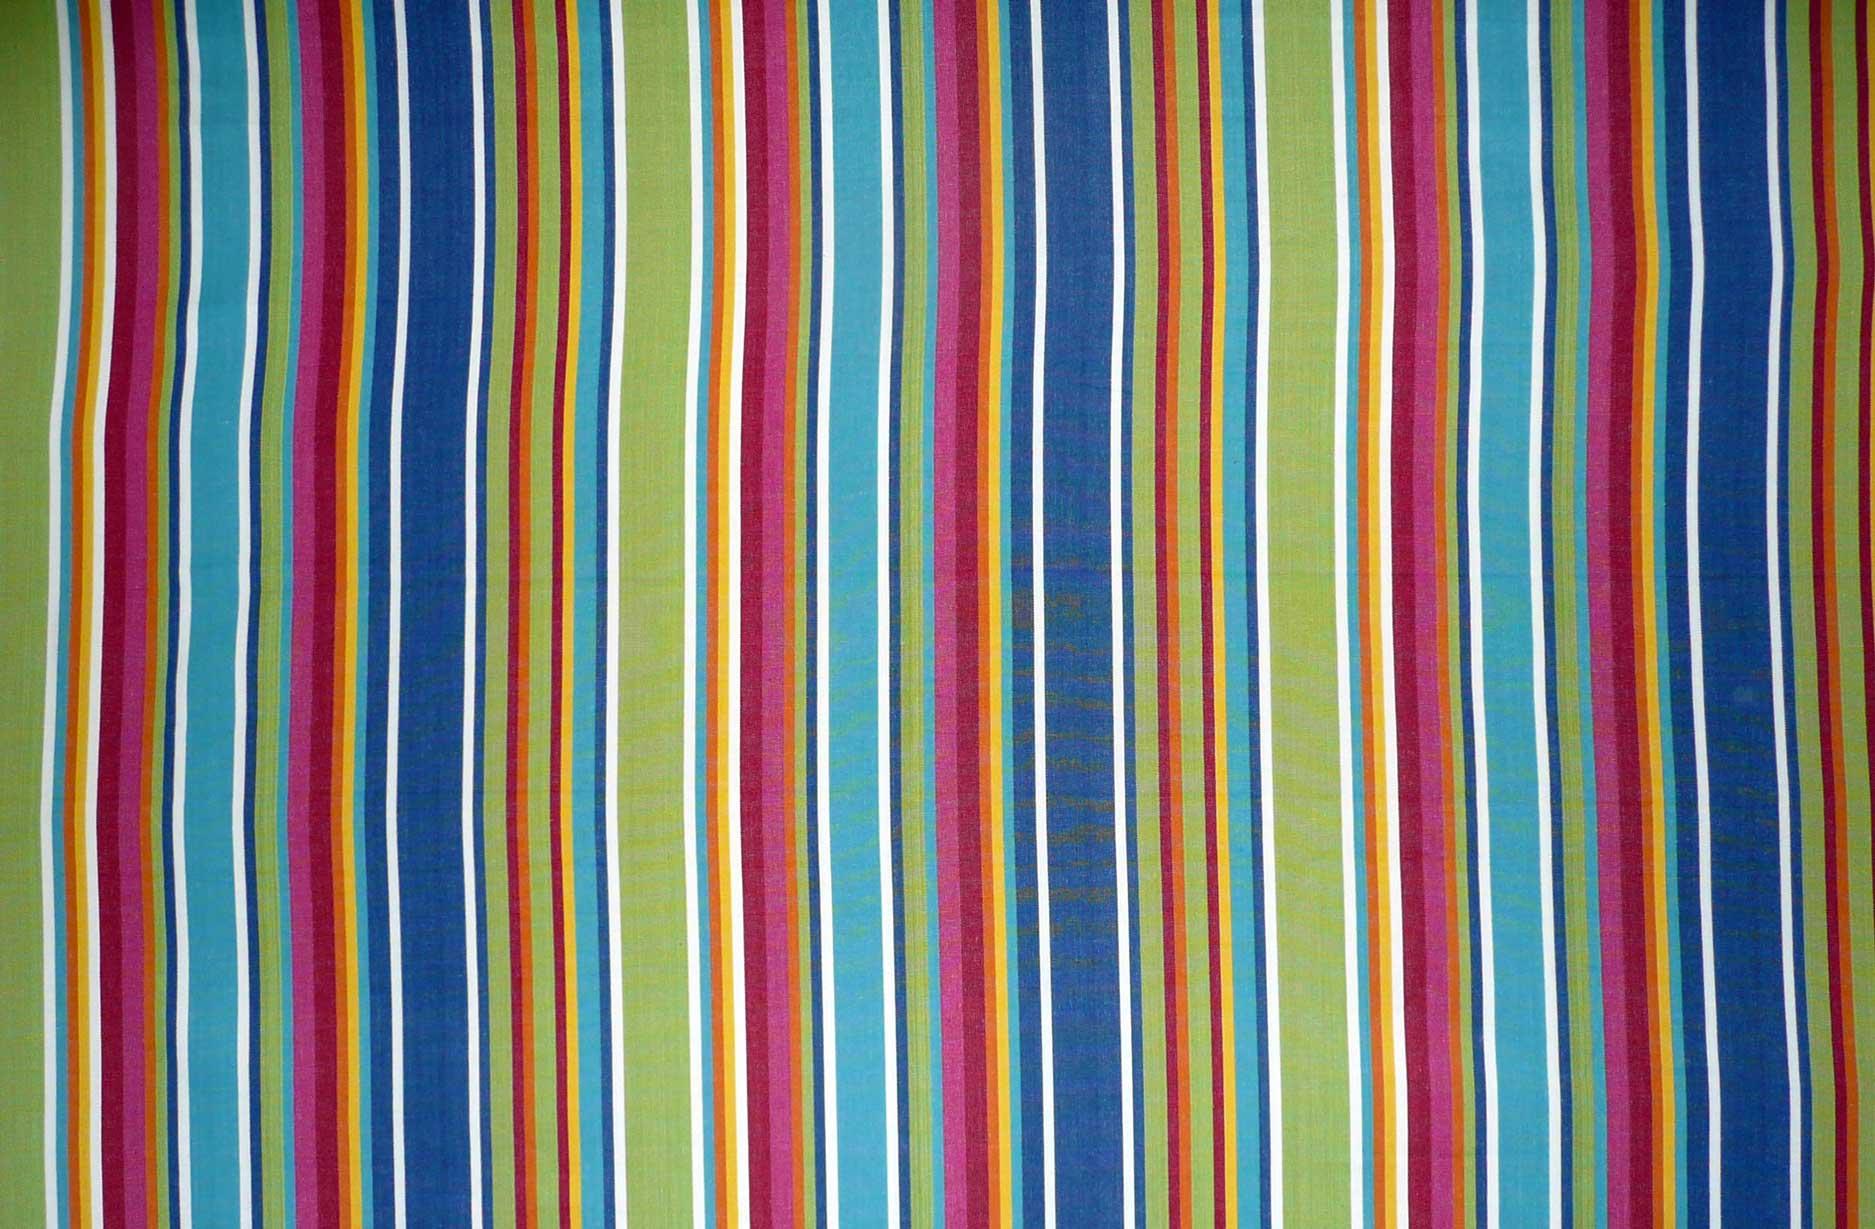 Rainbow Striped Fabrics | Striped Curtain Fabric - Climbing Stripes ...